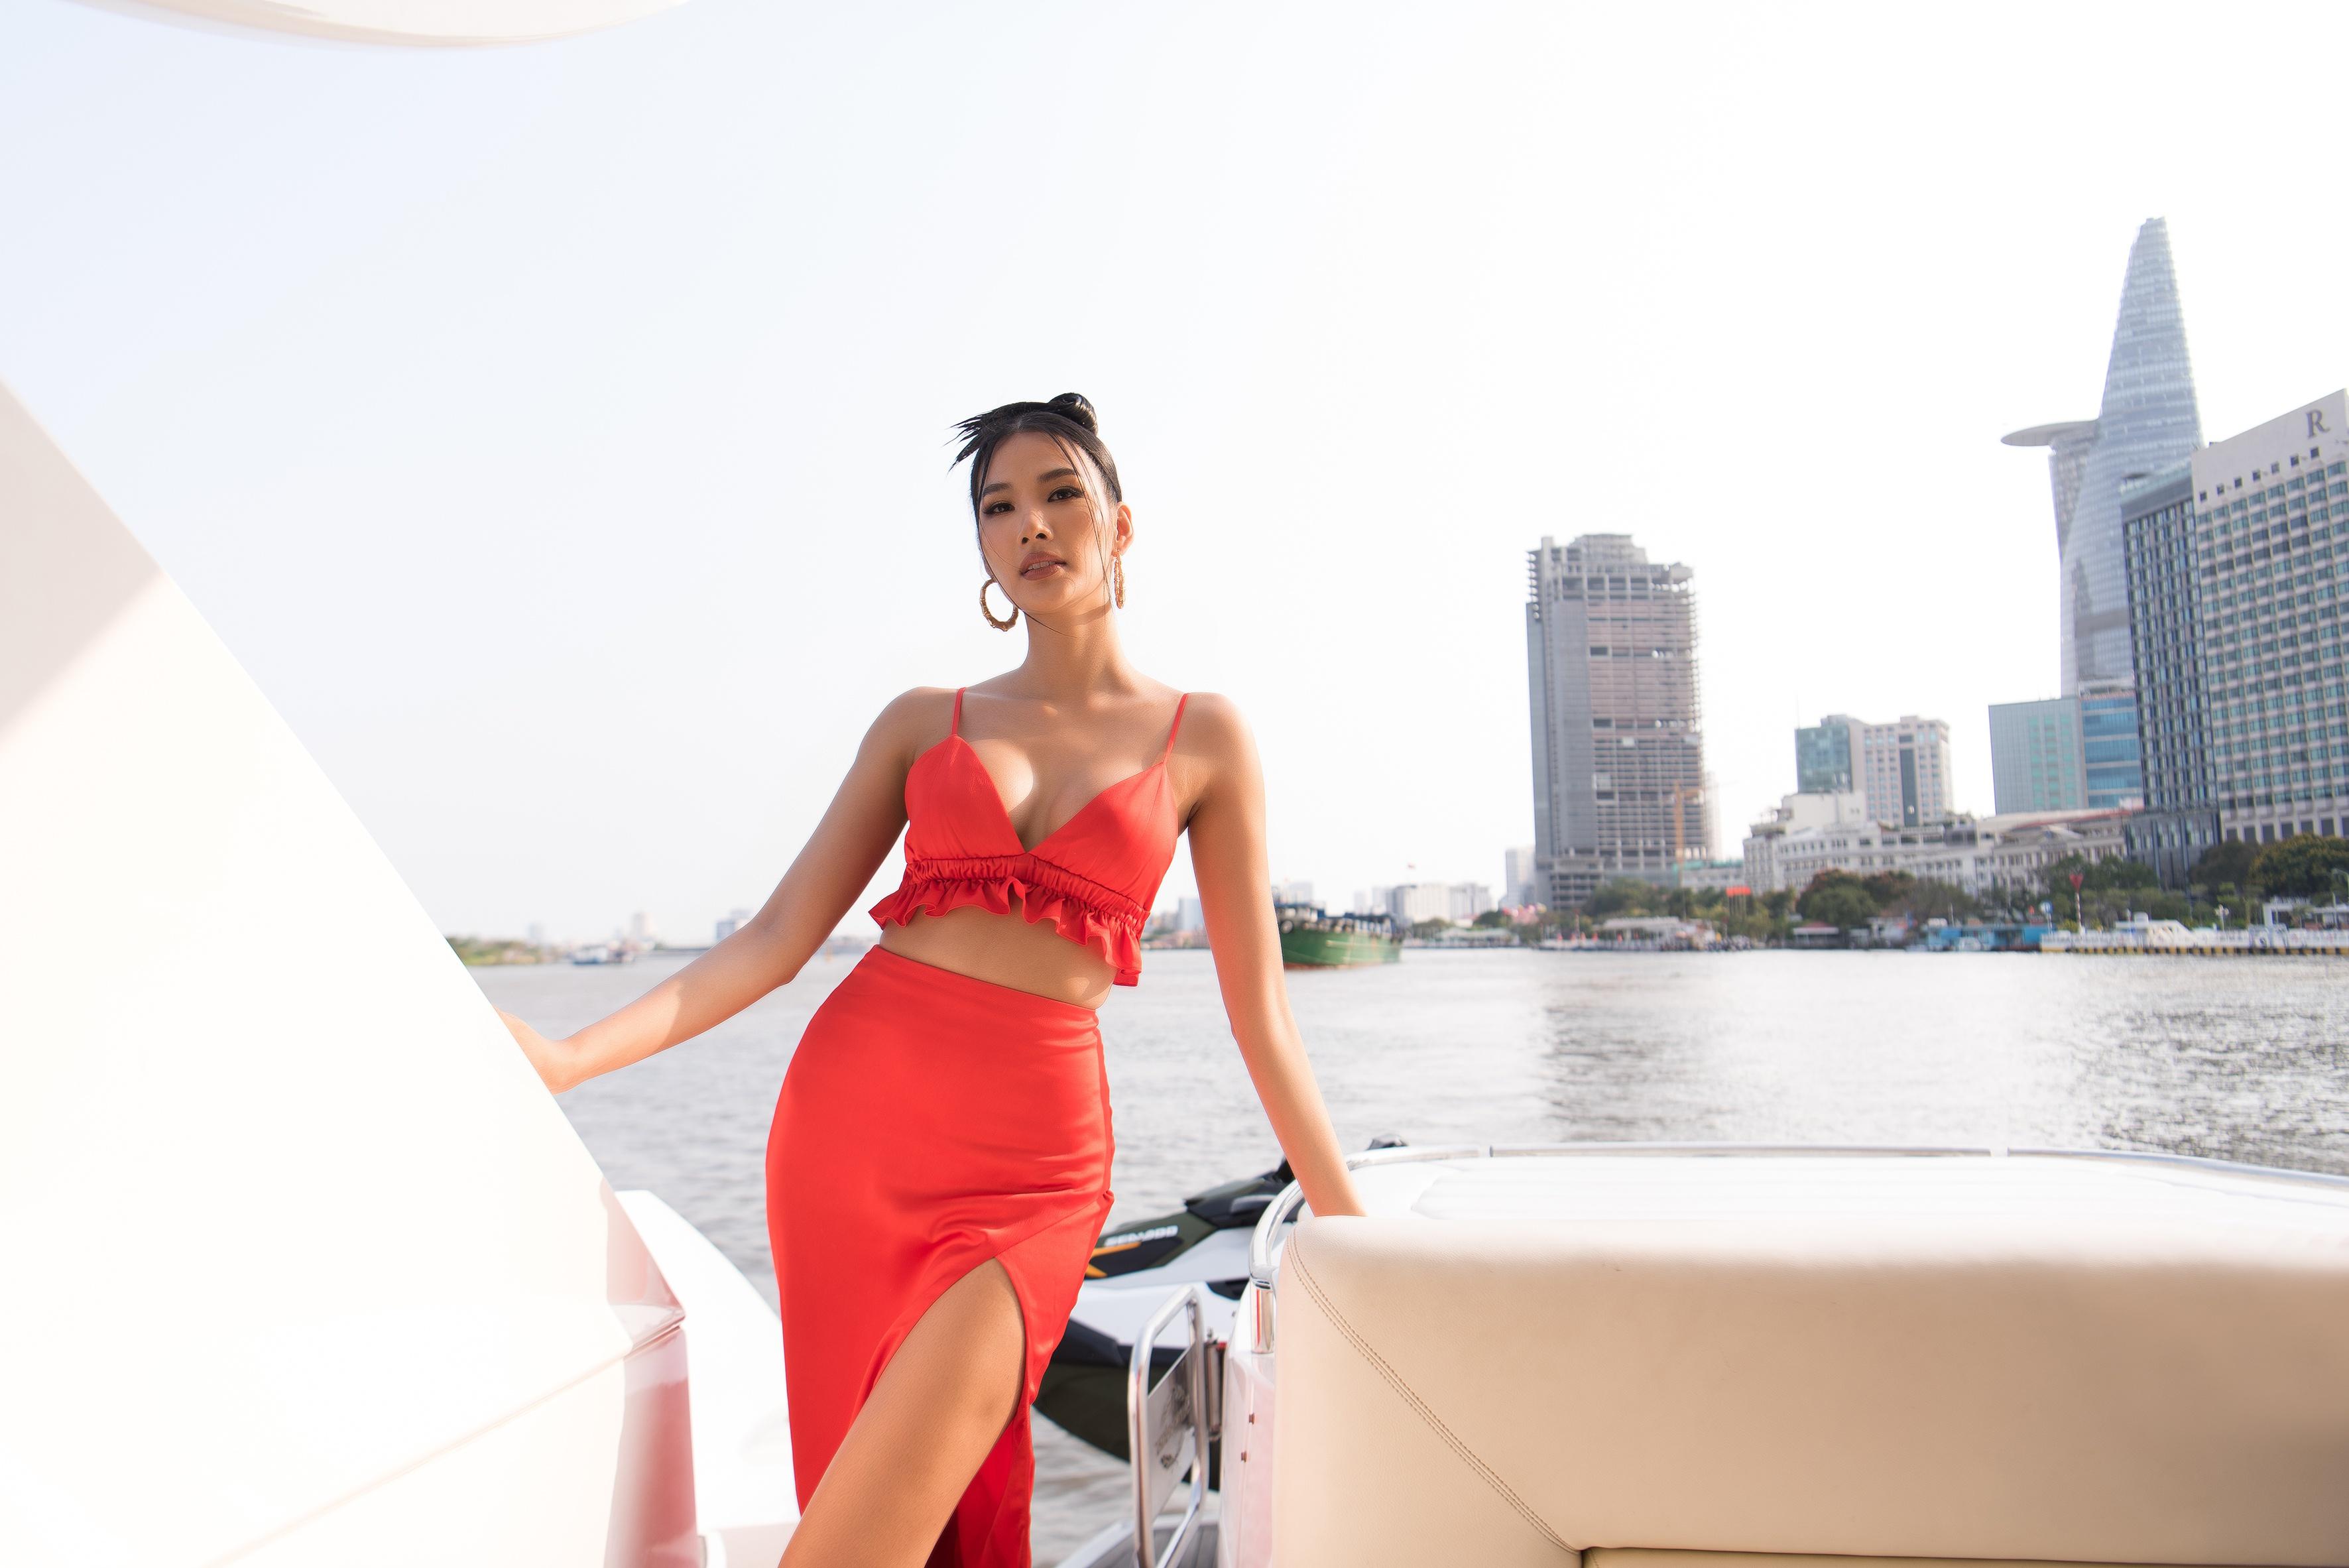 Hoa hau Sieu Quoc gia 2019 o Viet Nam 8 nam hinh anh 6 Miss_Universe_Viet_Nam_2019_Hoang_Thuy.jpg